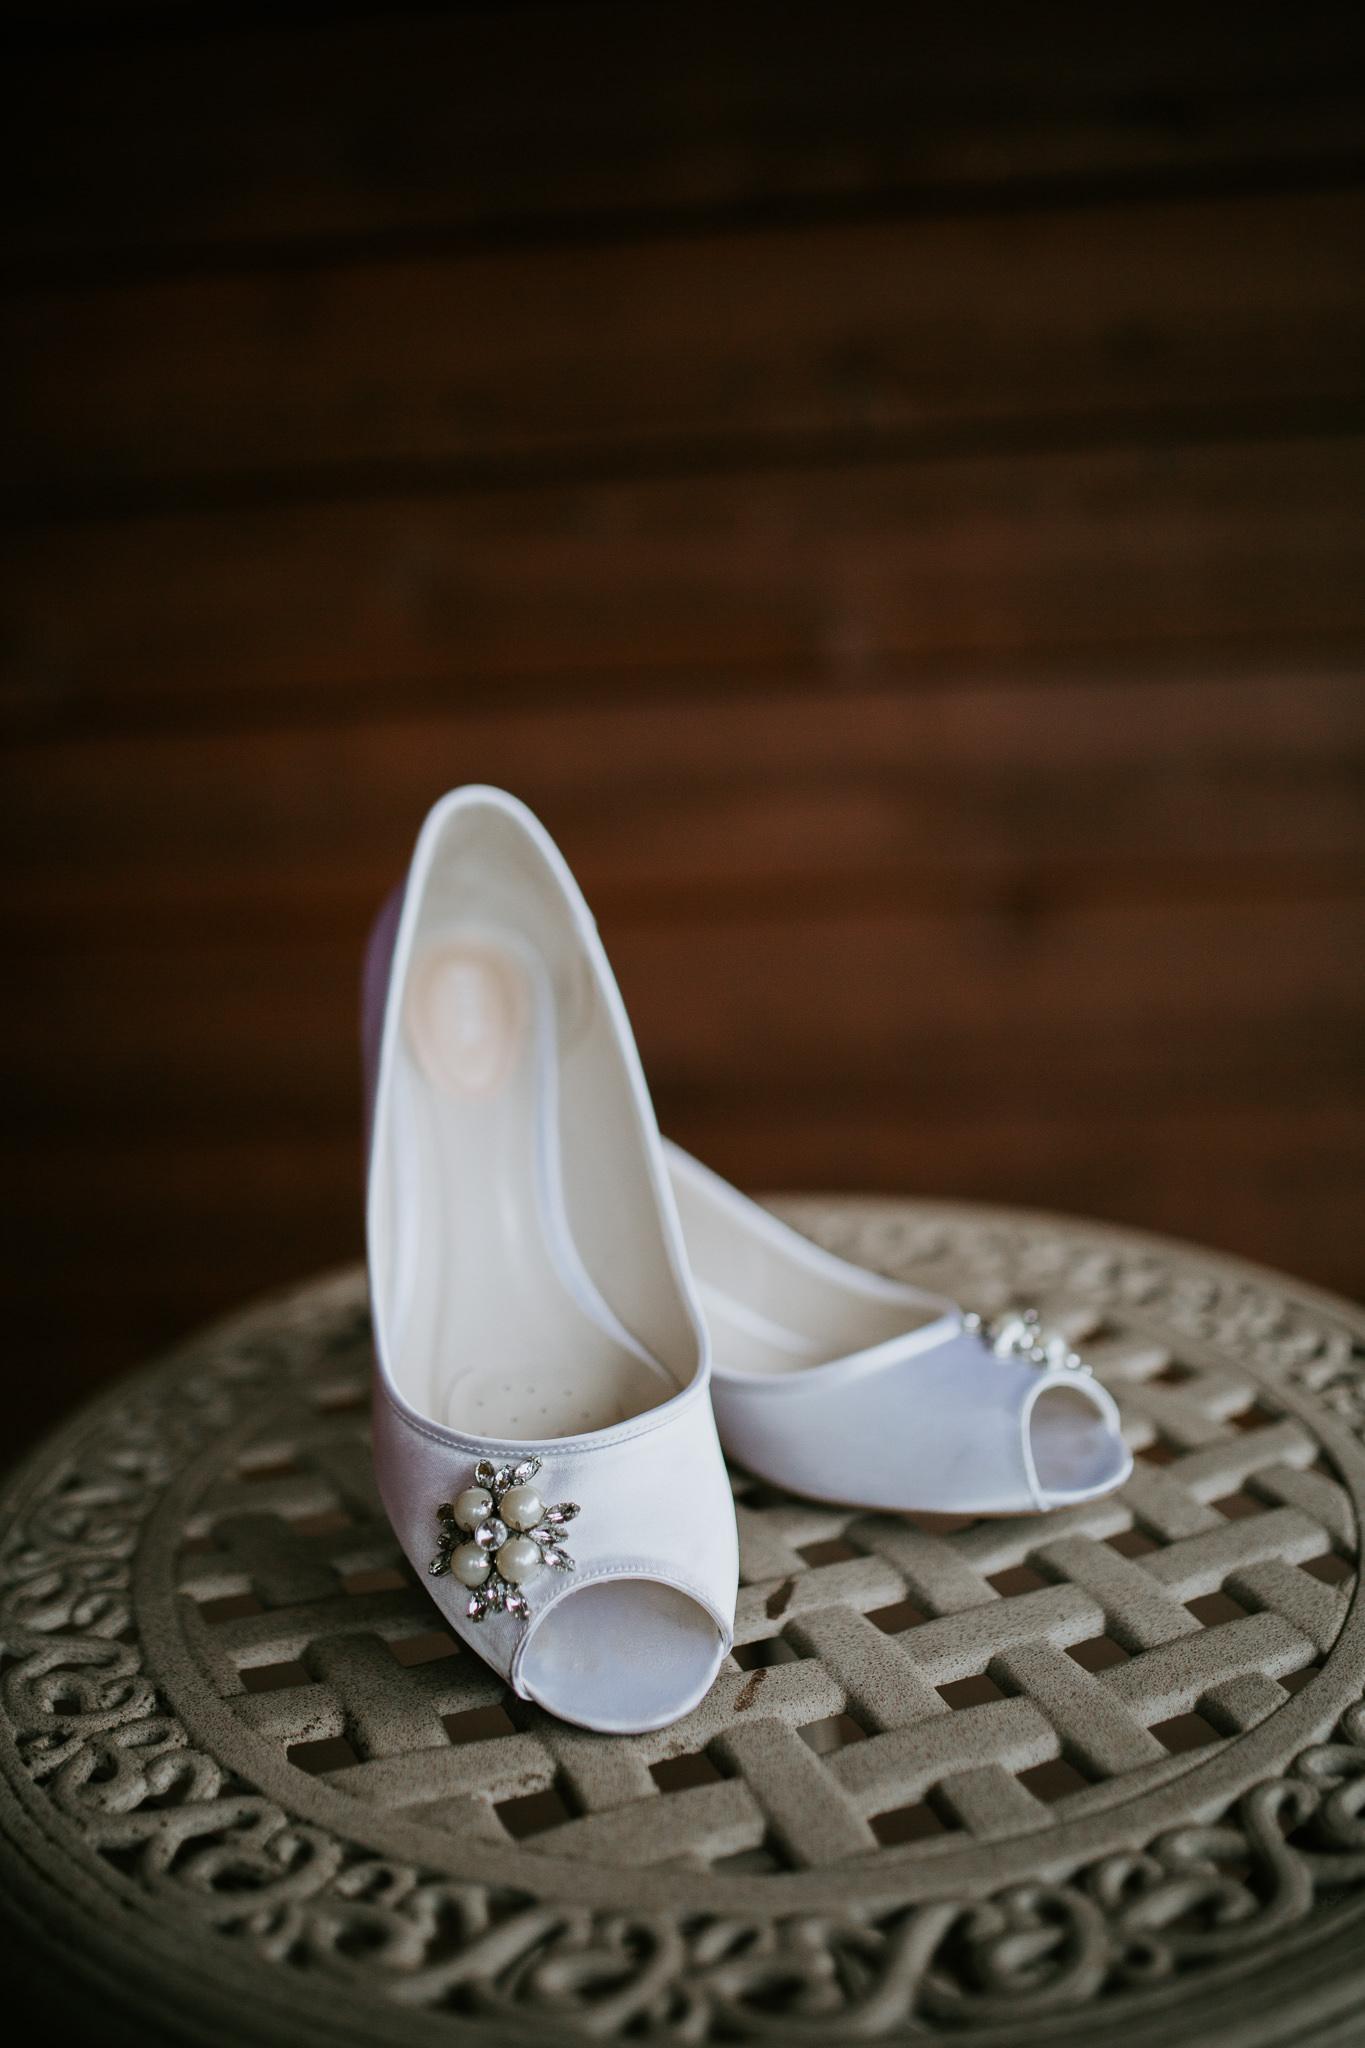 House Mountain Inn - Weddings - Lexington - Virginia - Best Wedding Photographer - Pat Cori Photography-8.jpg